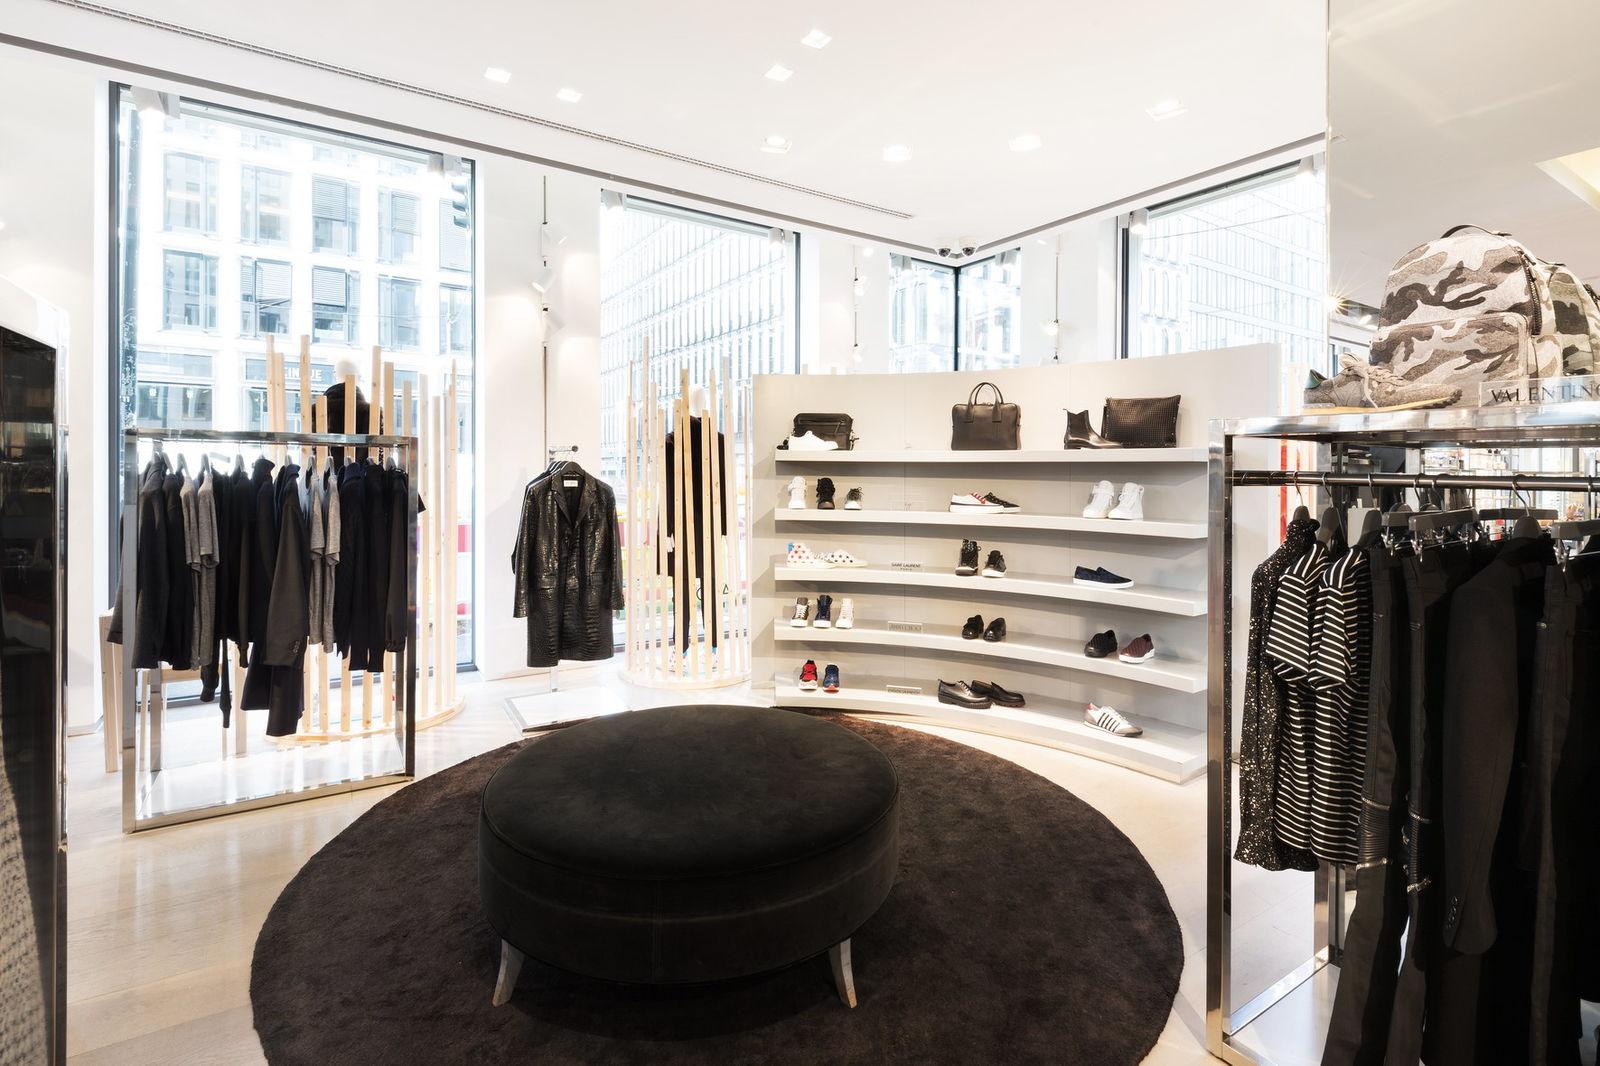 APROPOS The Concept Store in Düsseldorf (Bild 9)